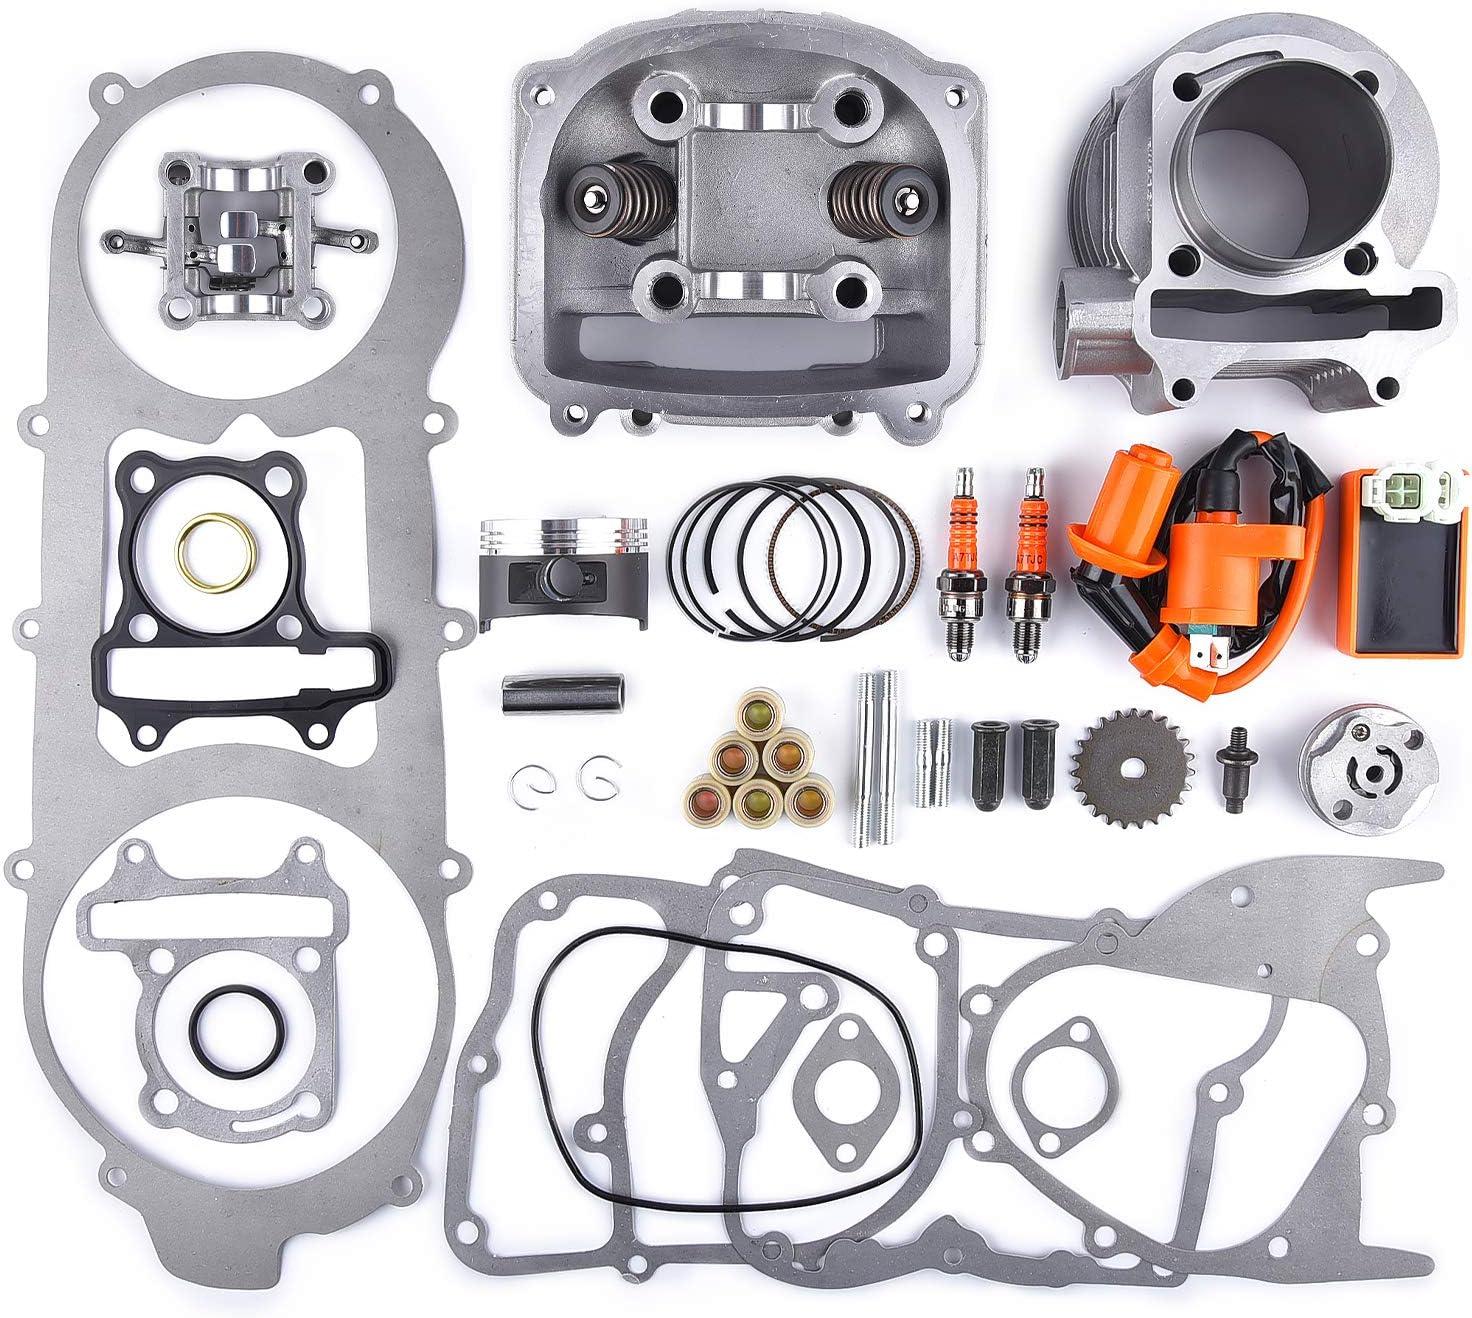 Amazon.com: Kit de cilindro de 2.260 in de diámetro 150 cc ...